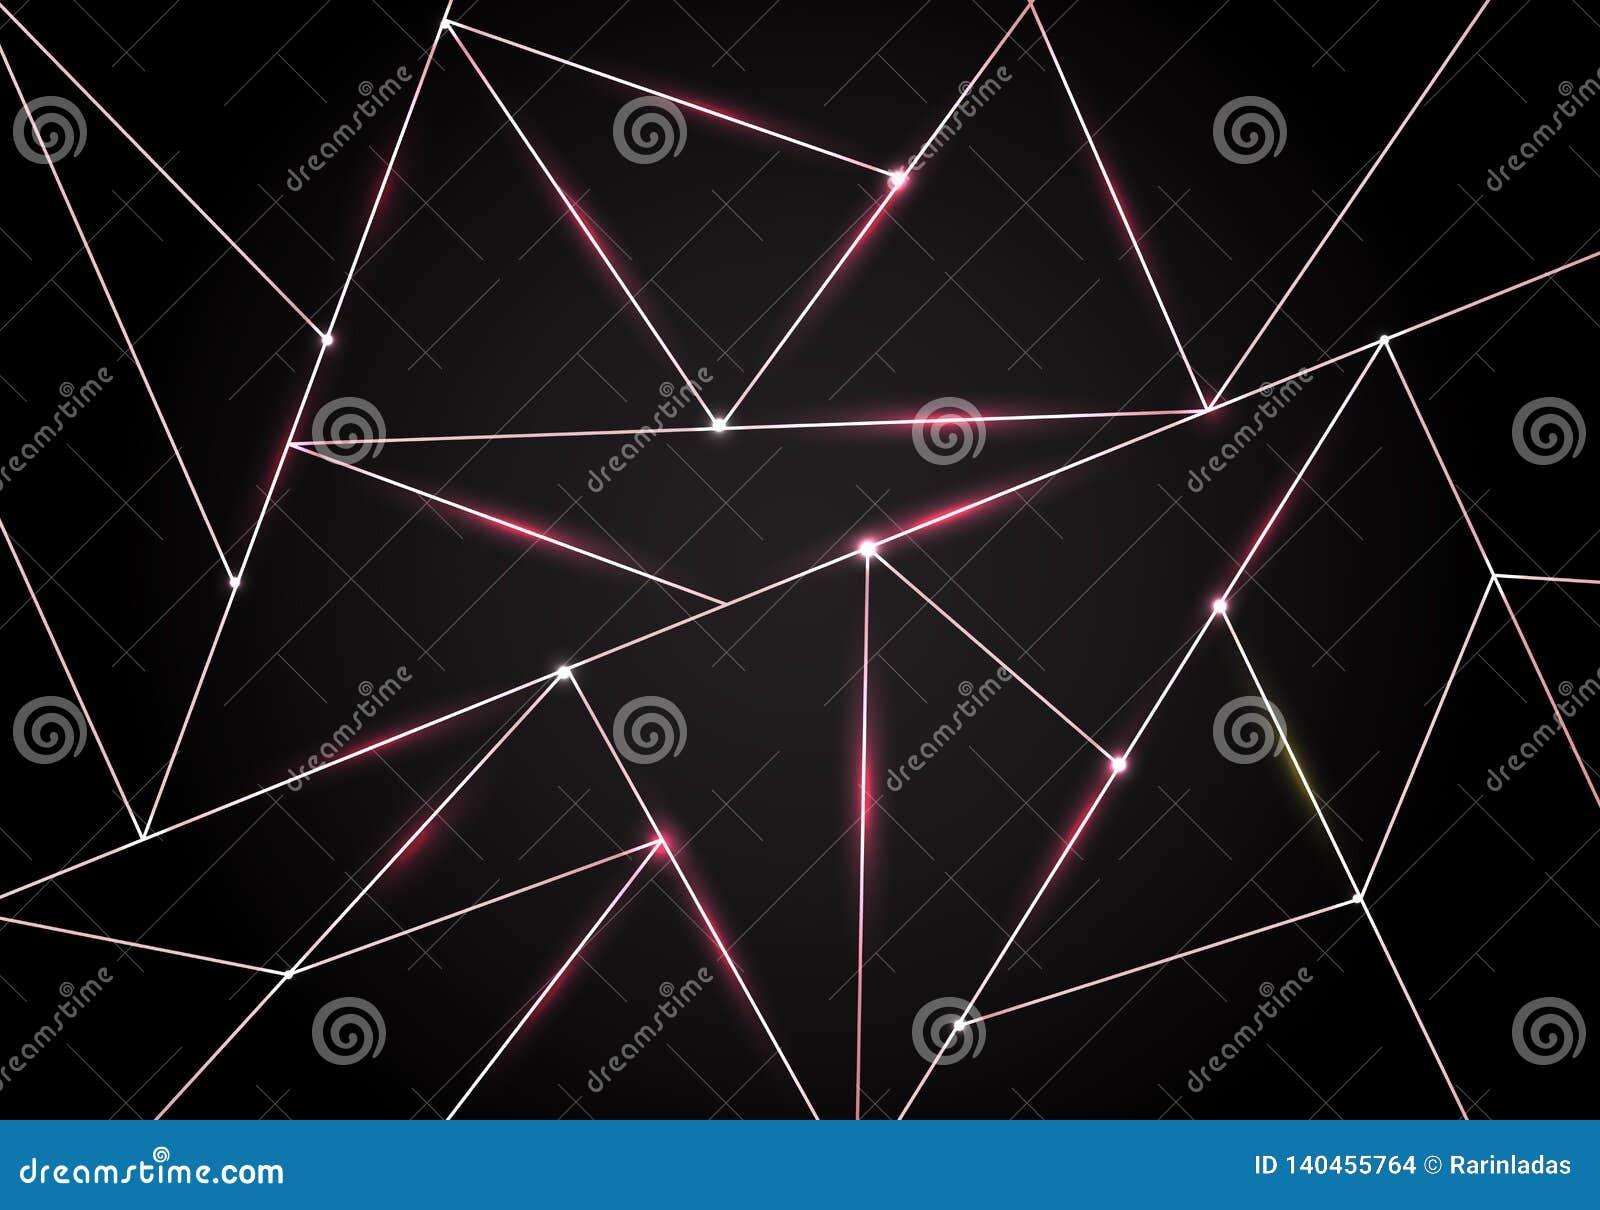 Polygonal σχέδιο πολυτέλειας και ρόδινες χρυσές γραμμές τριγώνων με το φωτισμό στο σκοτεινό υπόβαθρο Γεωμετρικές χαμηλές μορφές κ